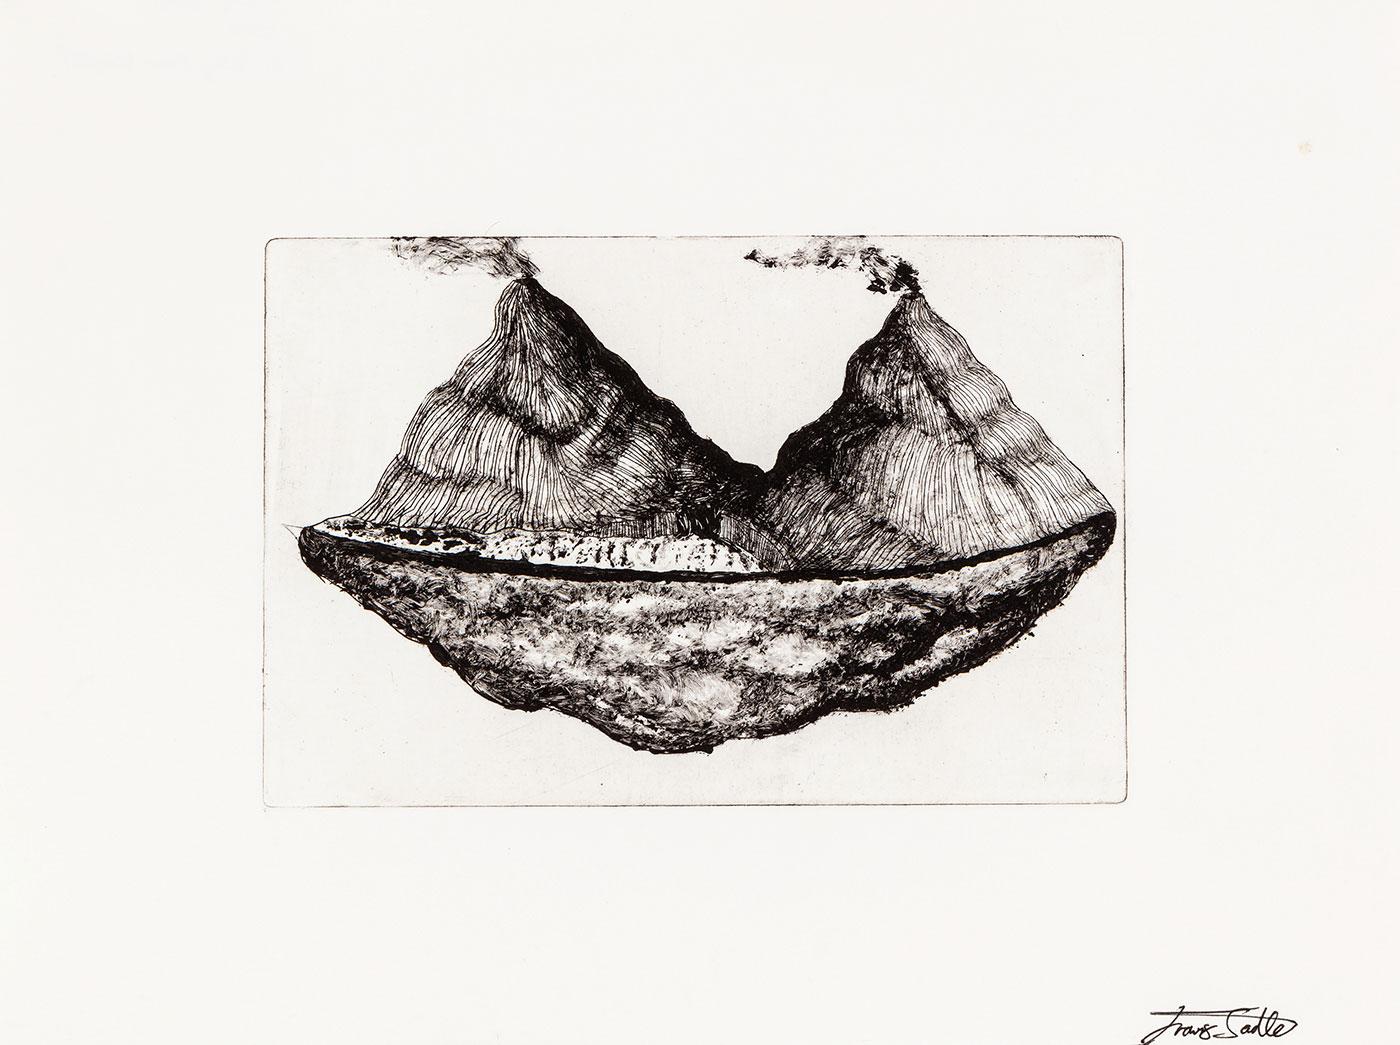 Travis J. Sadler - The Falling Dream